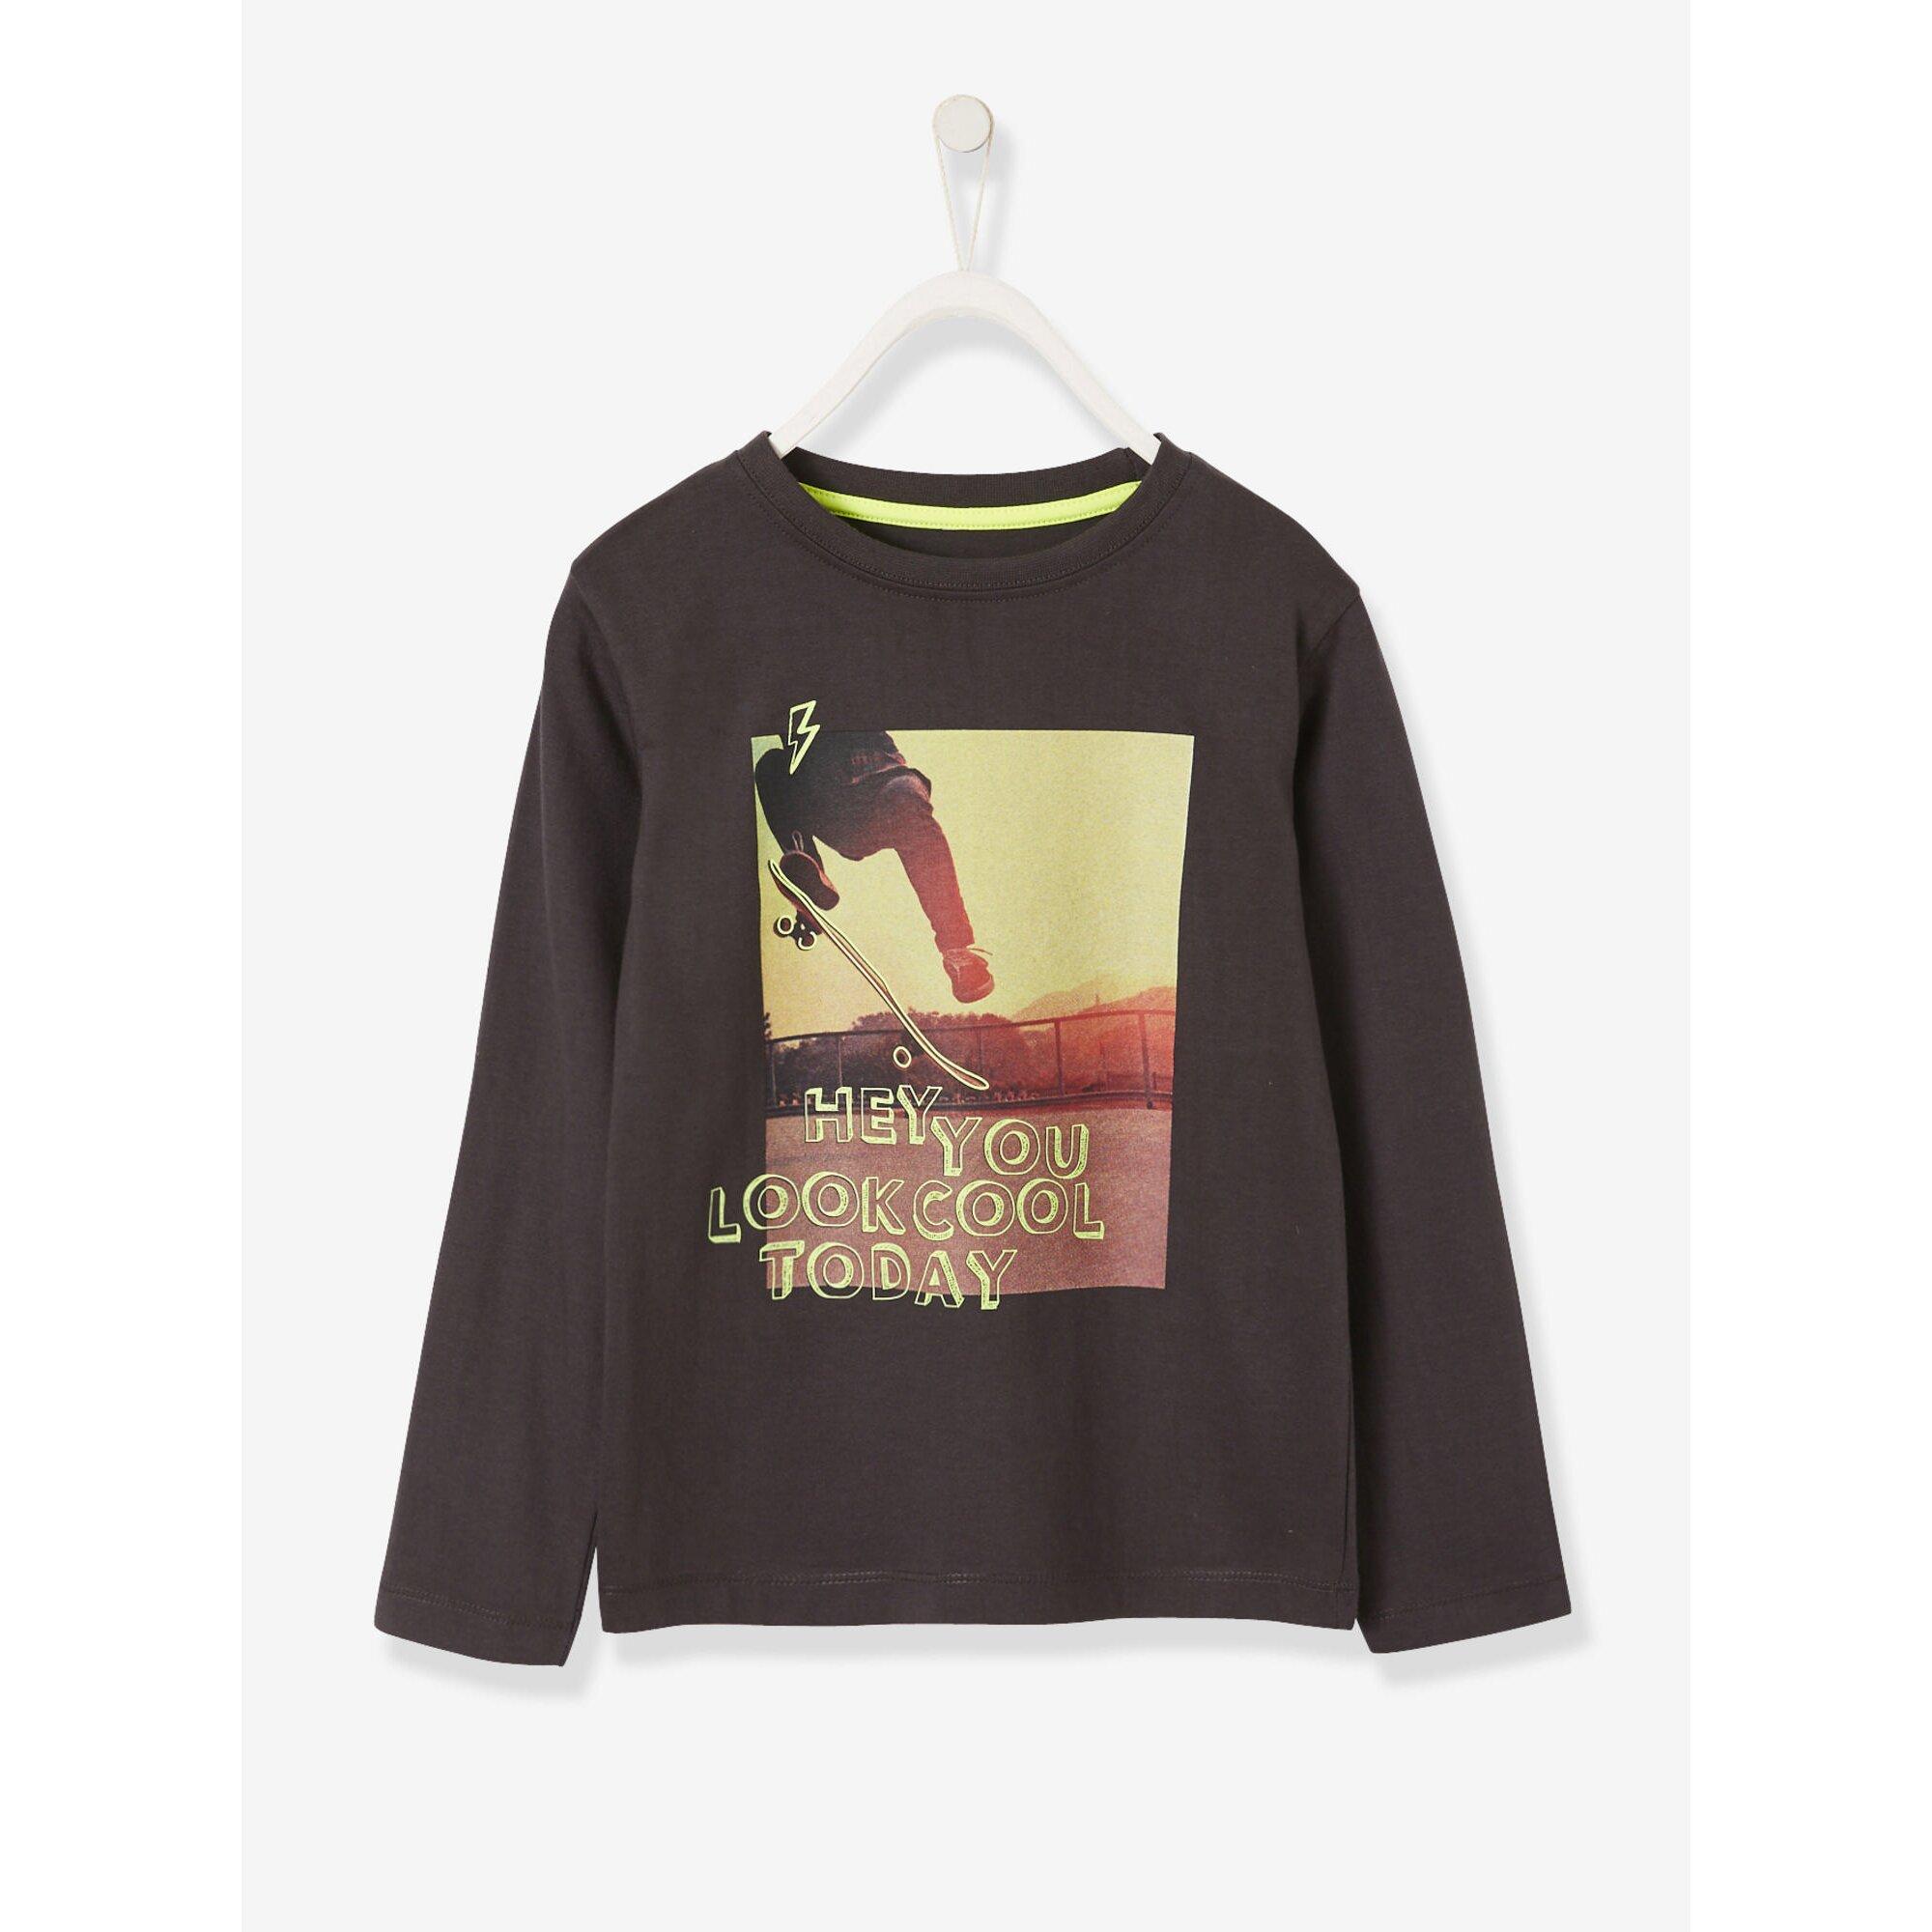 Vertbaudet Langarm-Shirt für Jungen, Skatermotiv